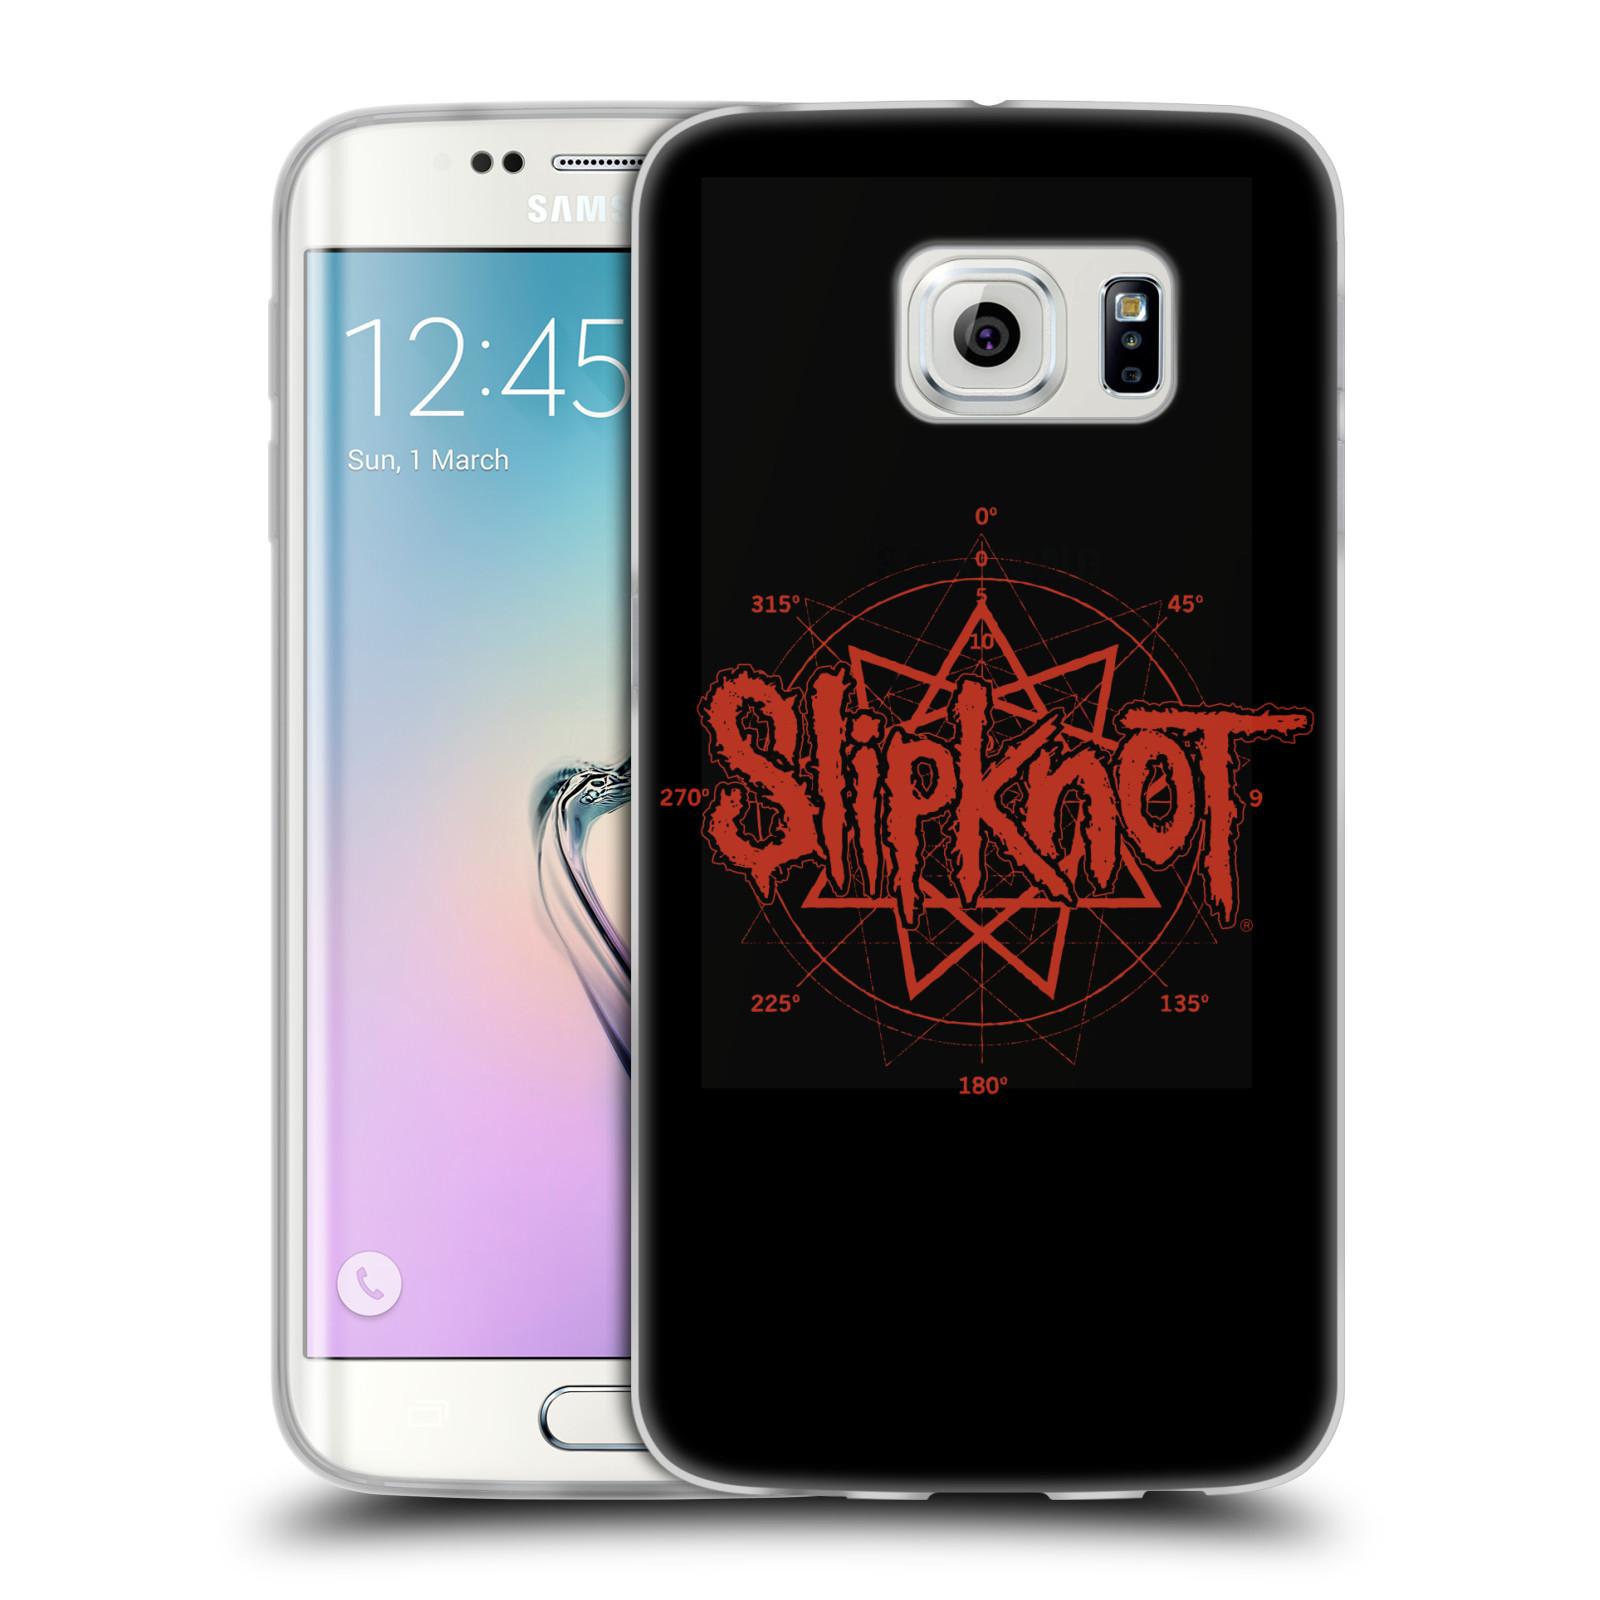 HEAD CASE silikonový obal na mobil Samsung Galaxy S6 EDGE hudební skupina Slipknot logo